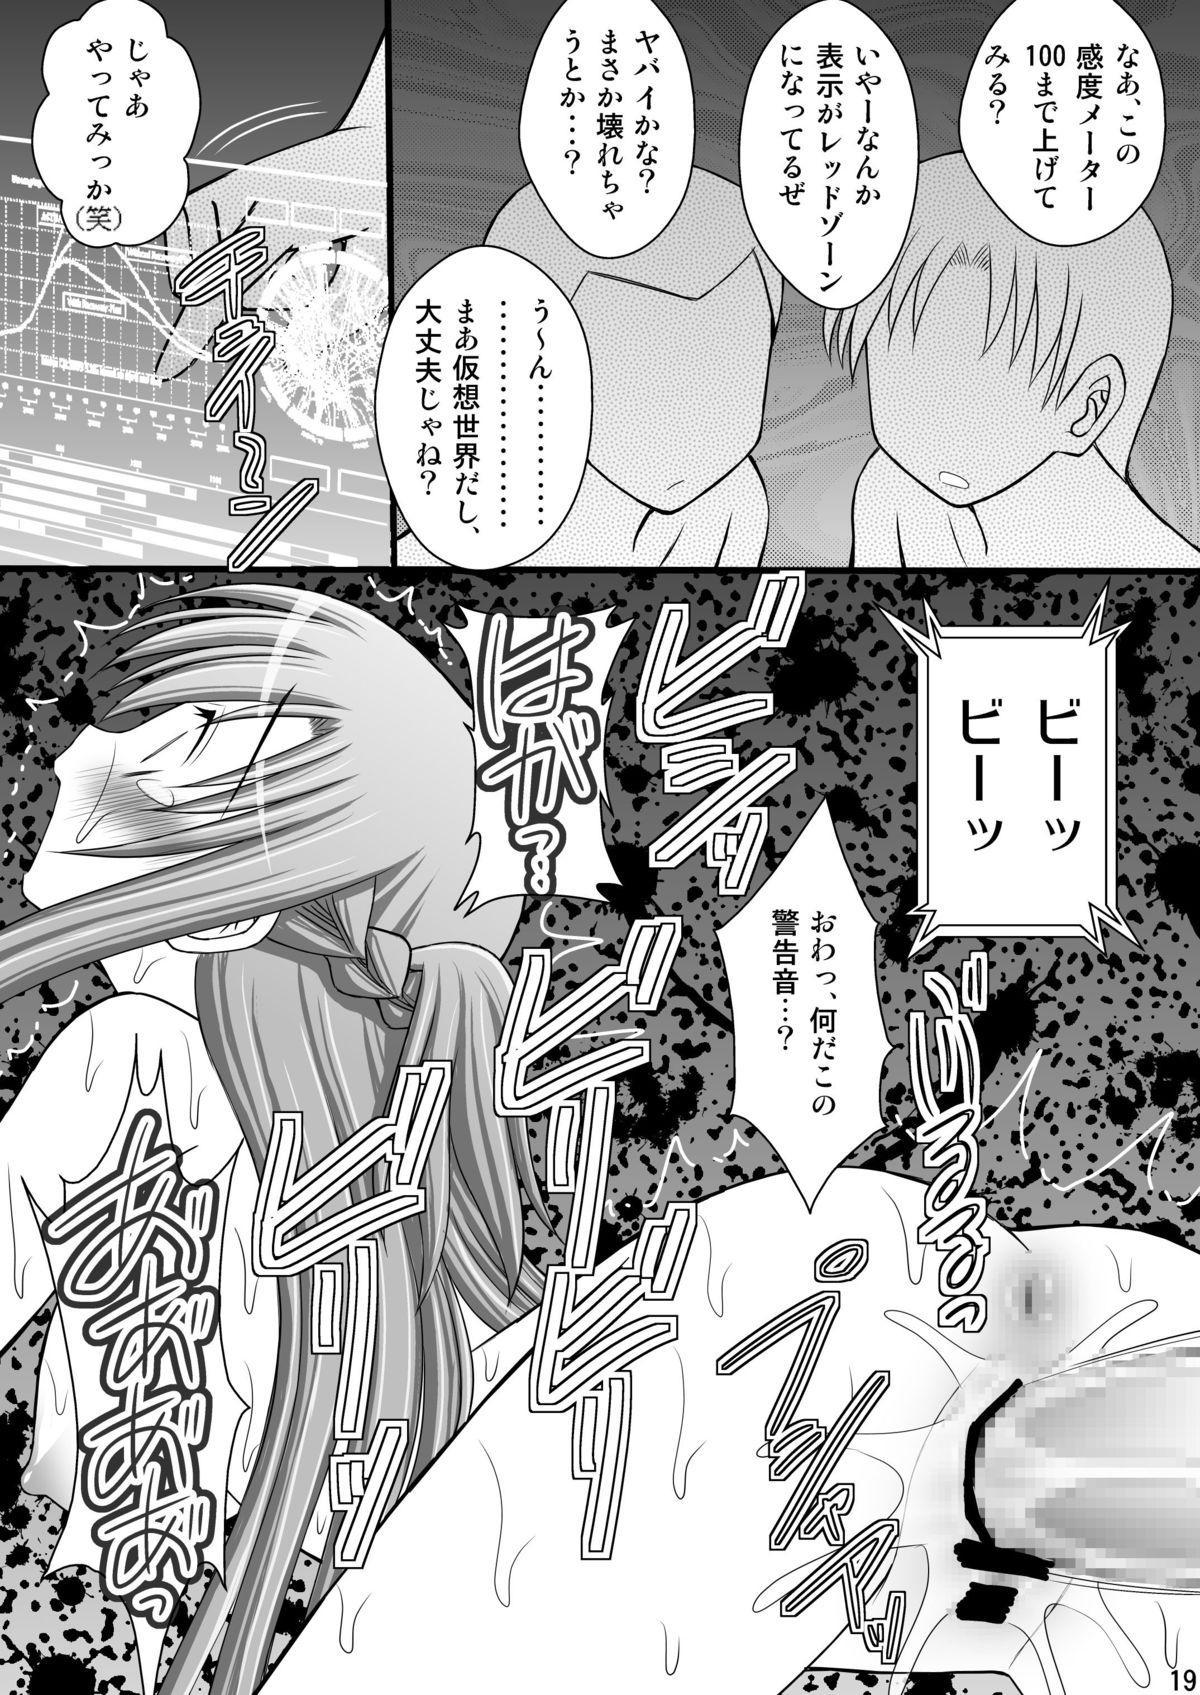 Toraware Hime III: Hostage Princess III 17